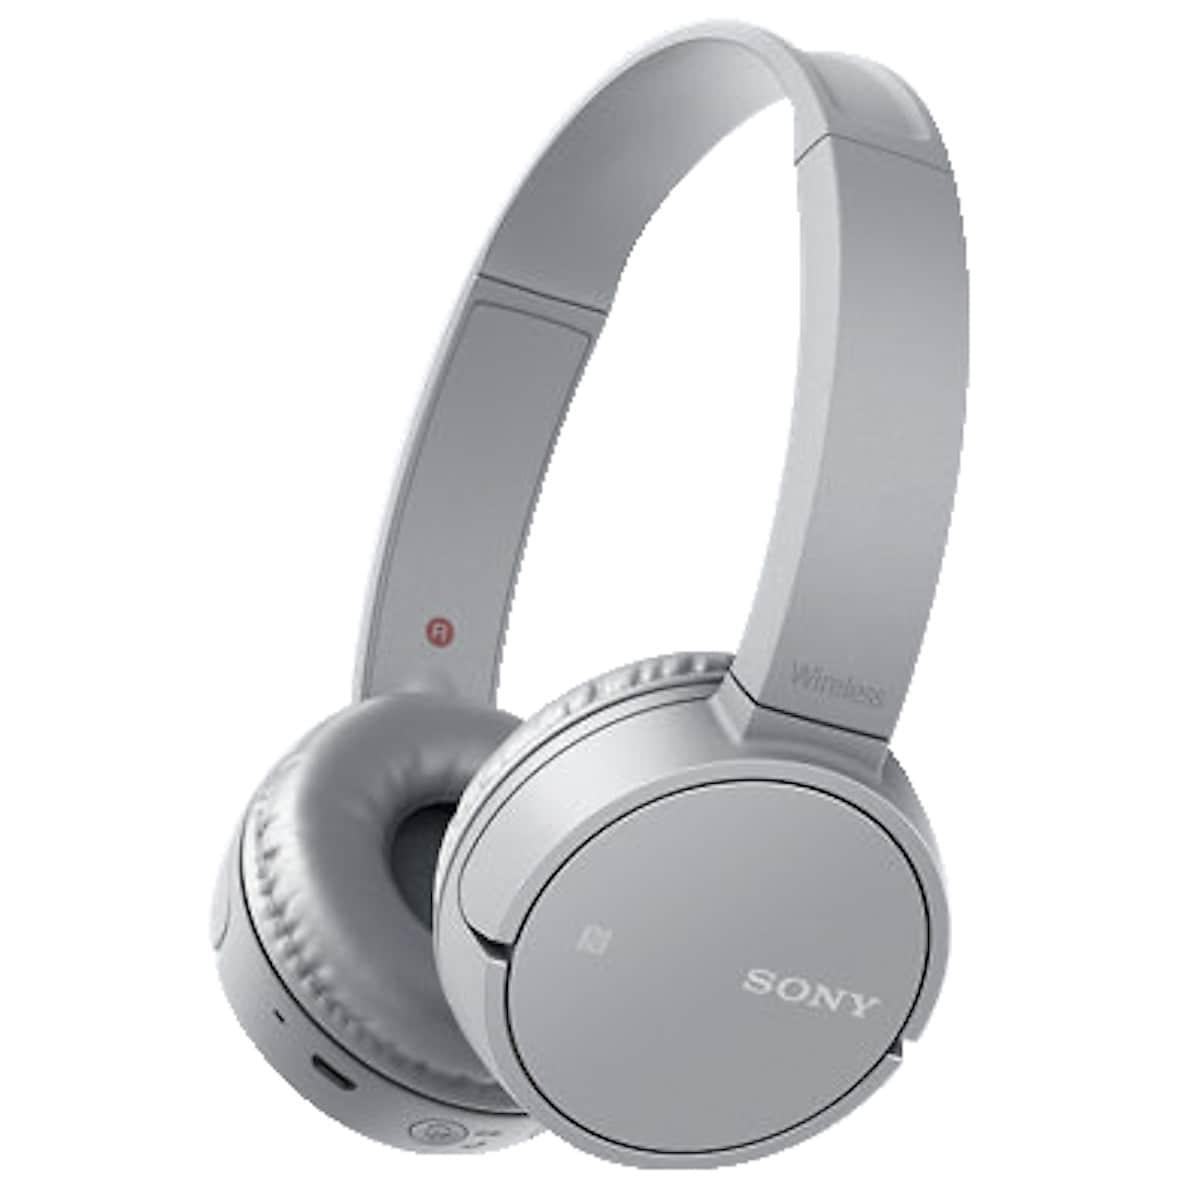 Trådlösa hörlurar med mikrofon, Sony WH-CH500